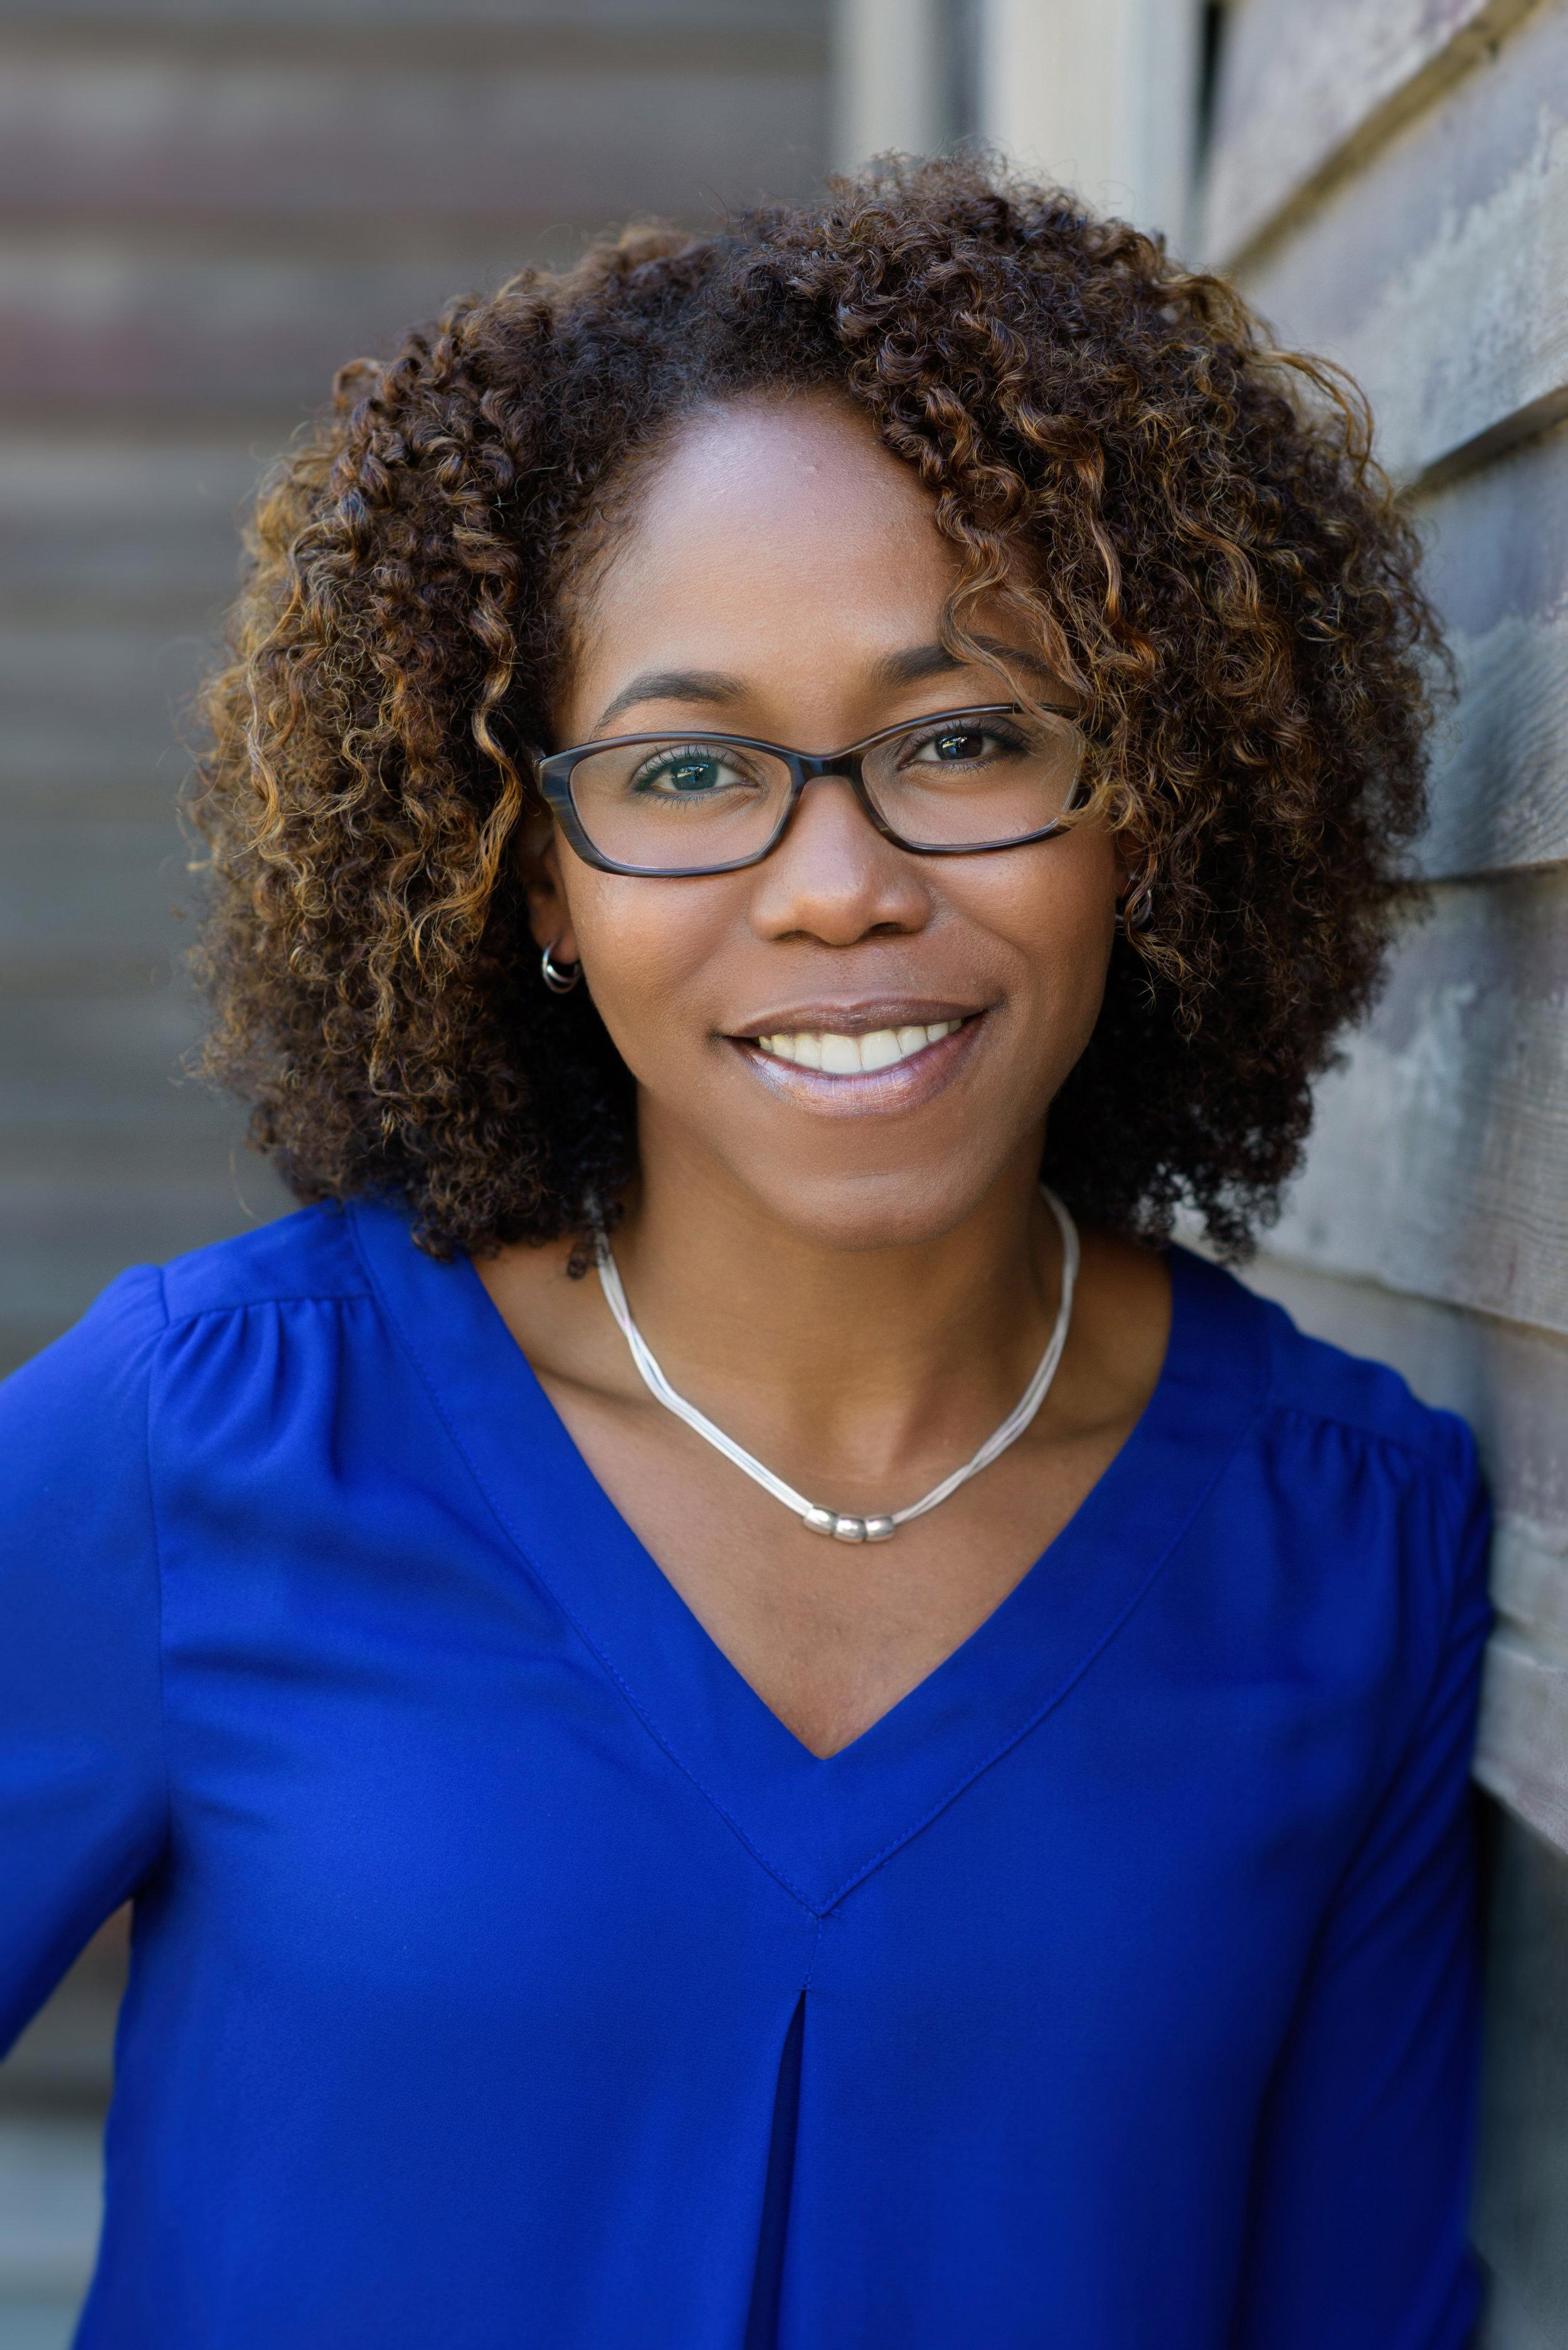 Pleasanton Headshot Photographer for female entrepreneur